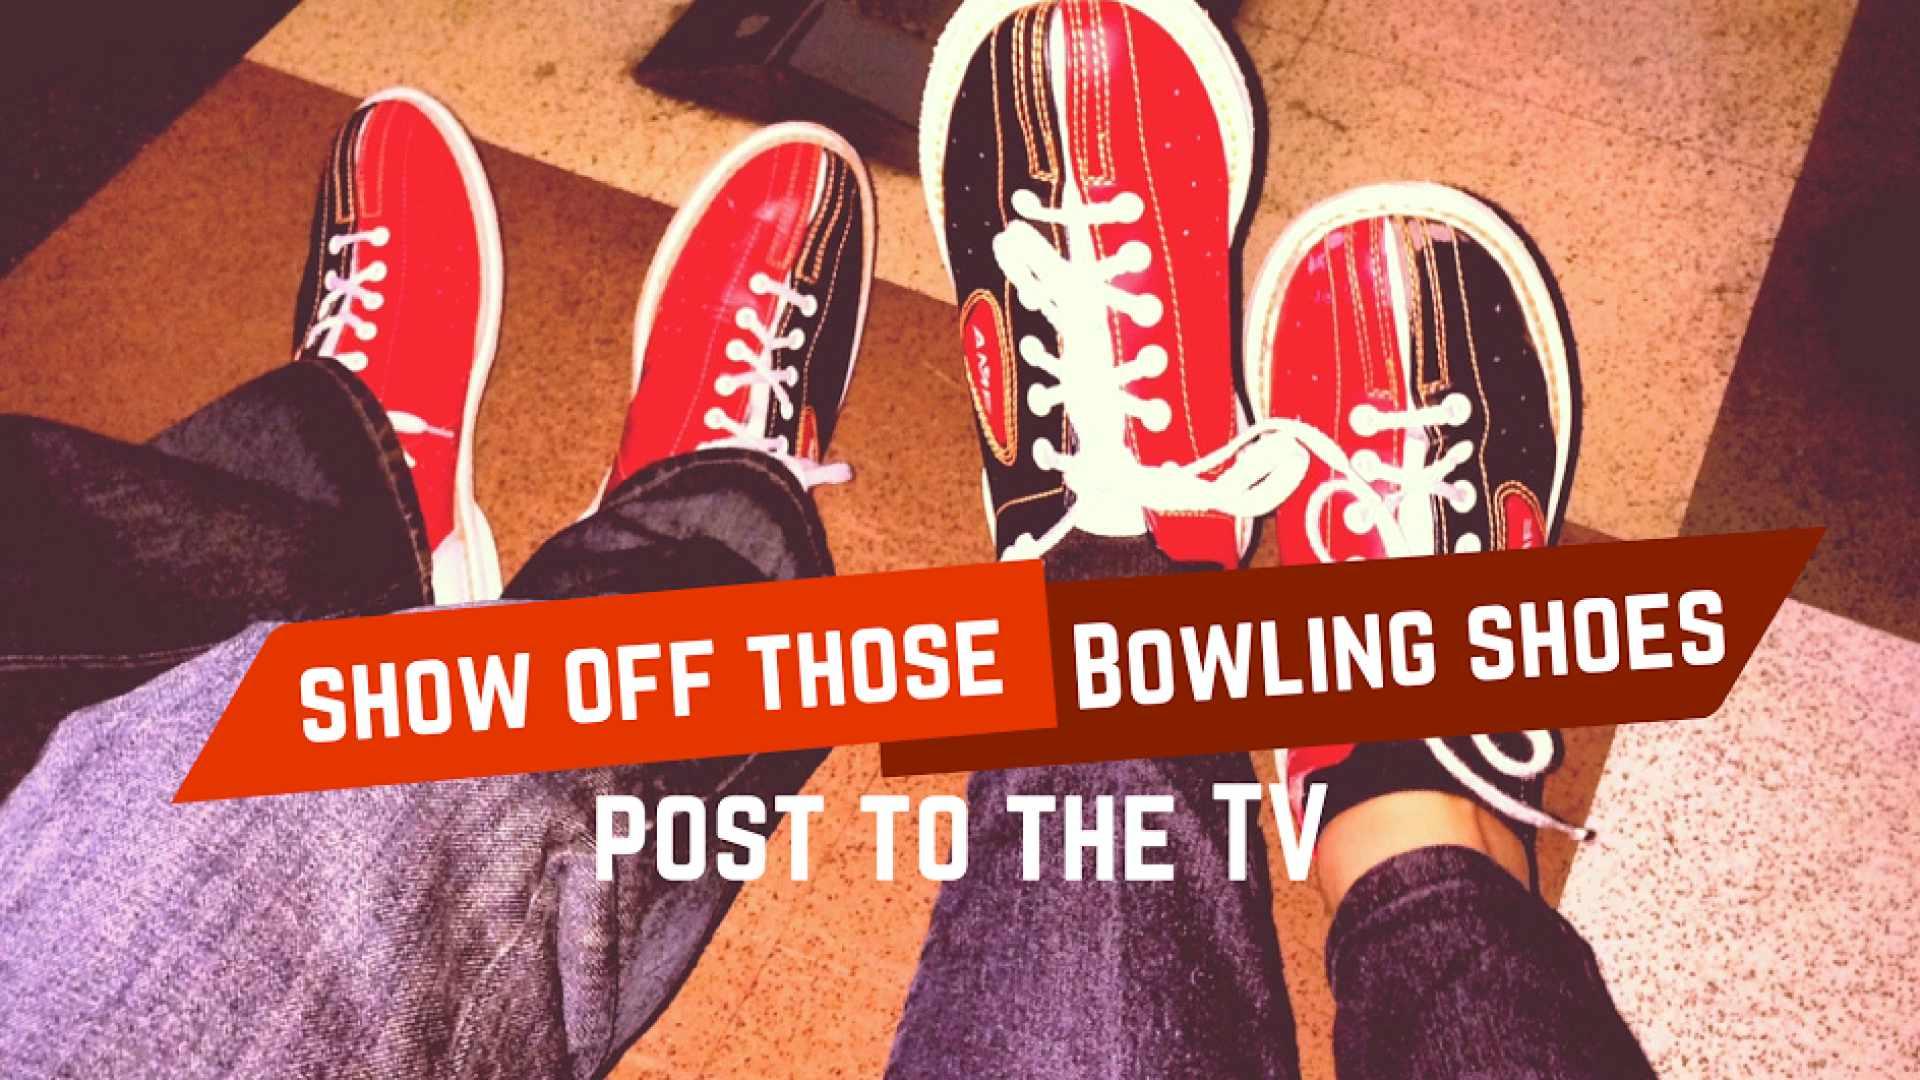 BowlingShoes_Spotlight.png